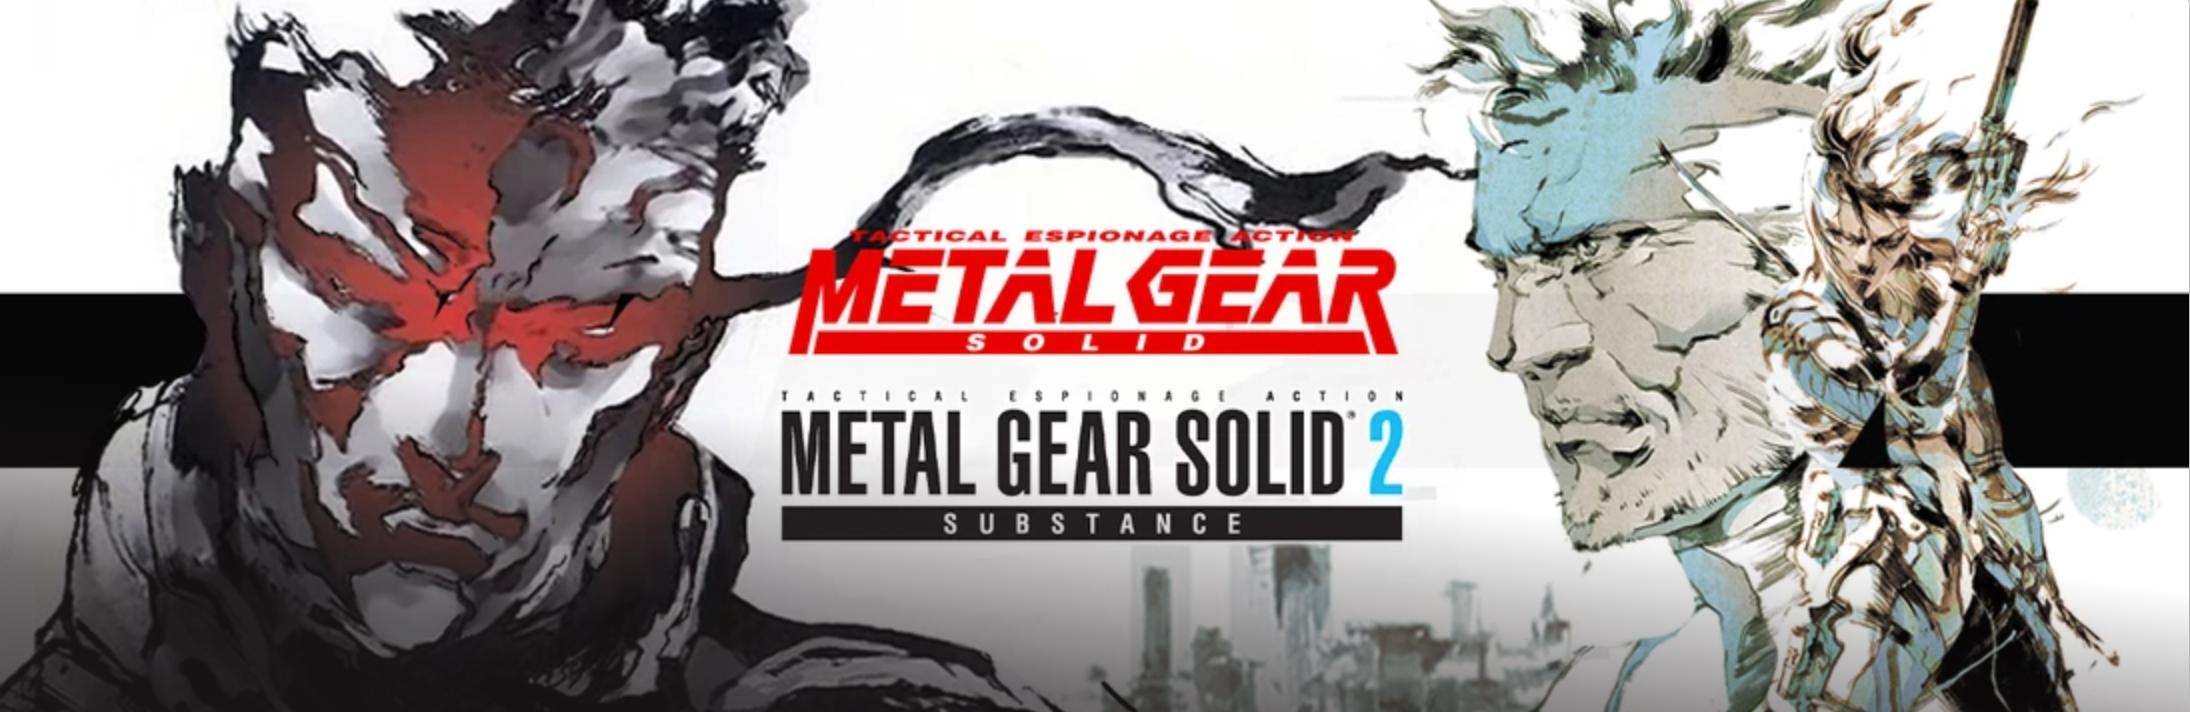 metal gear solid metal gear solid 2